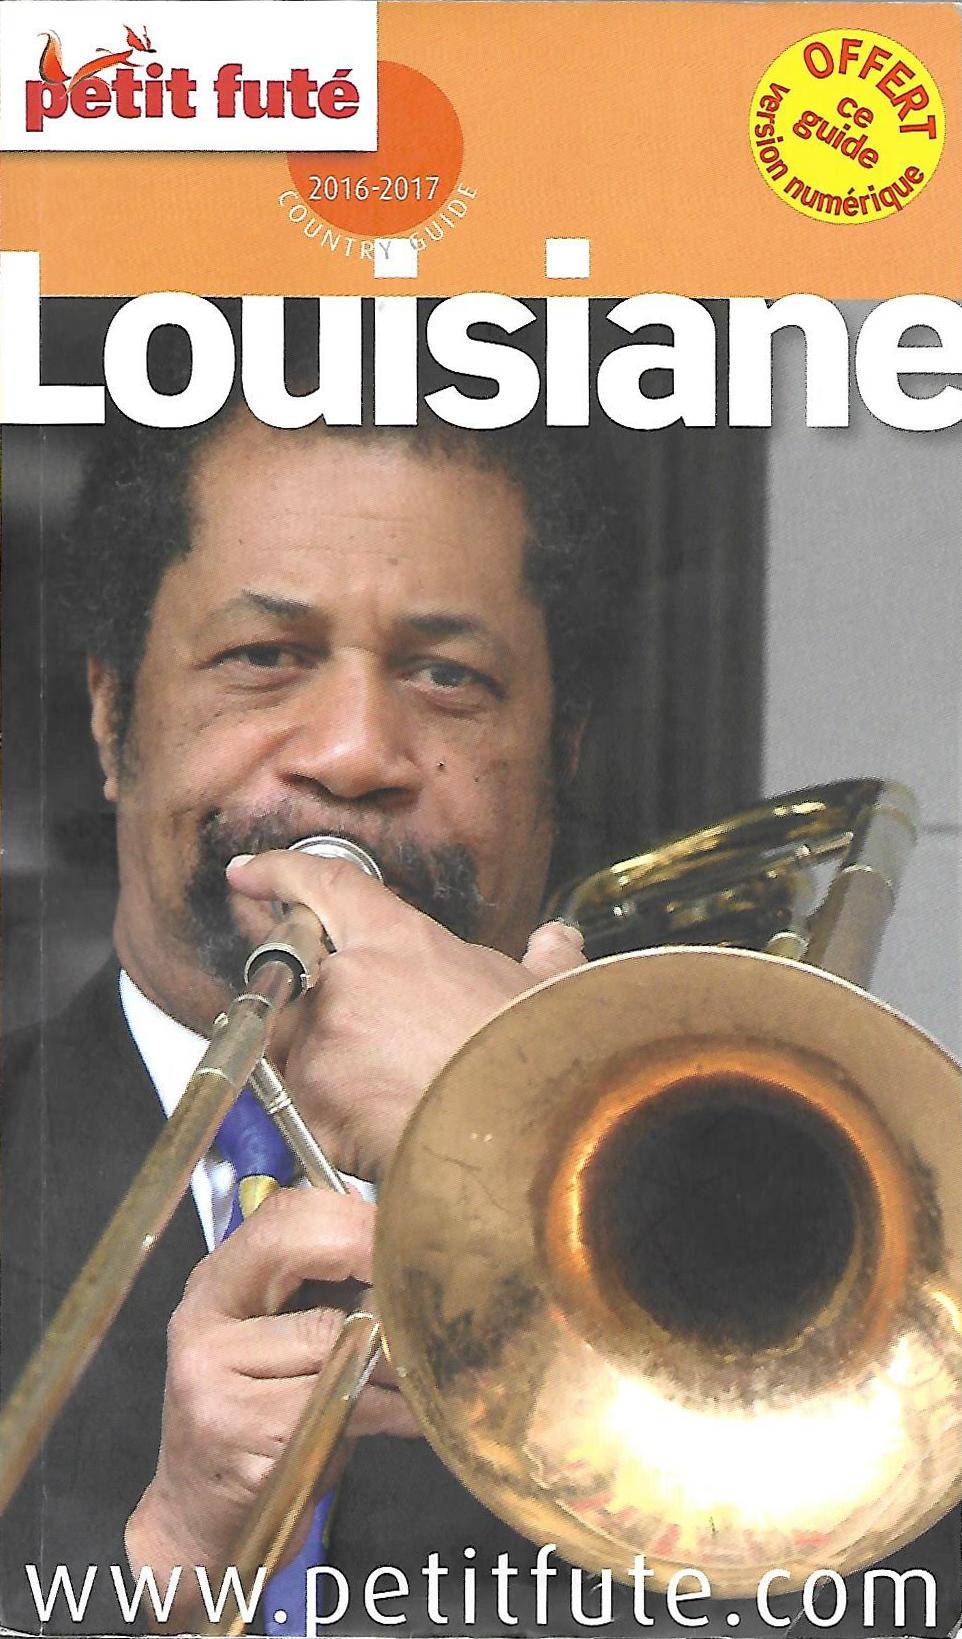 Petit-Fute-Louisiane-Cover.png